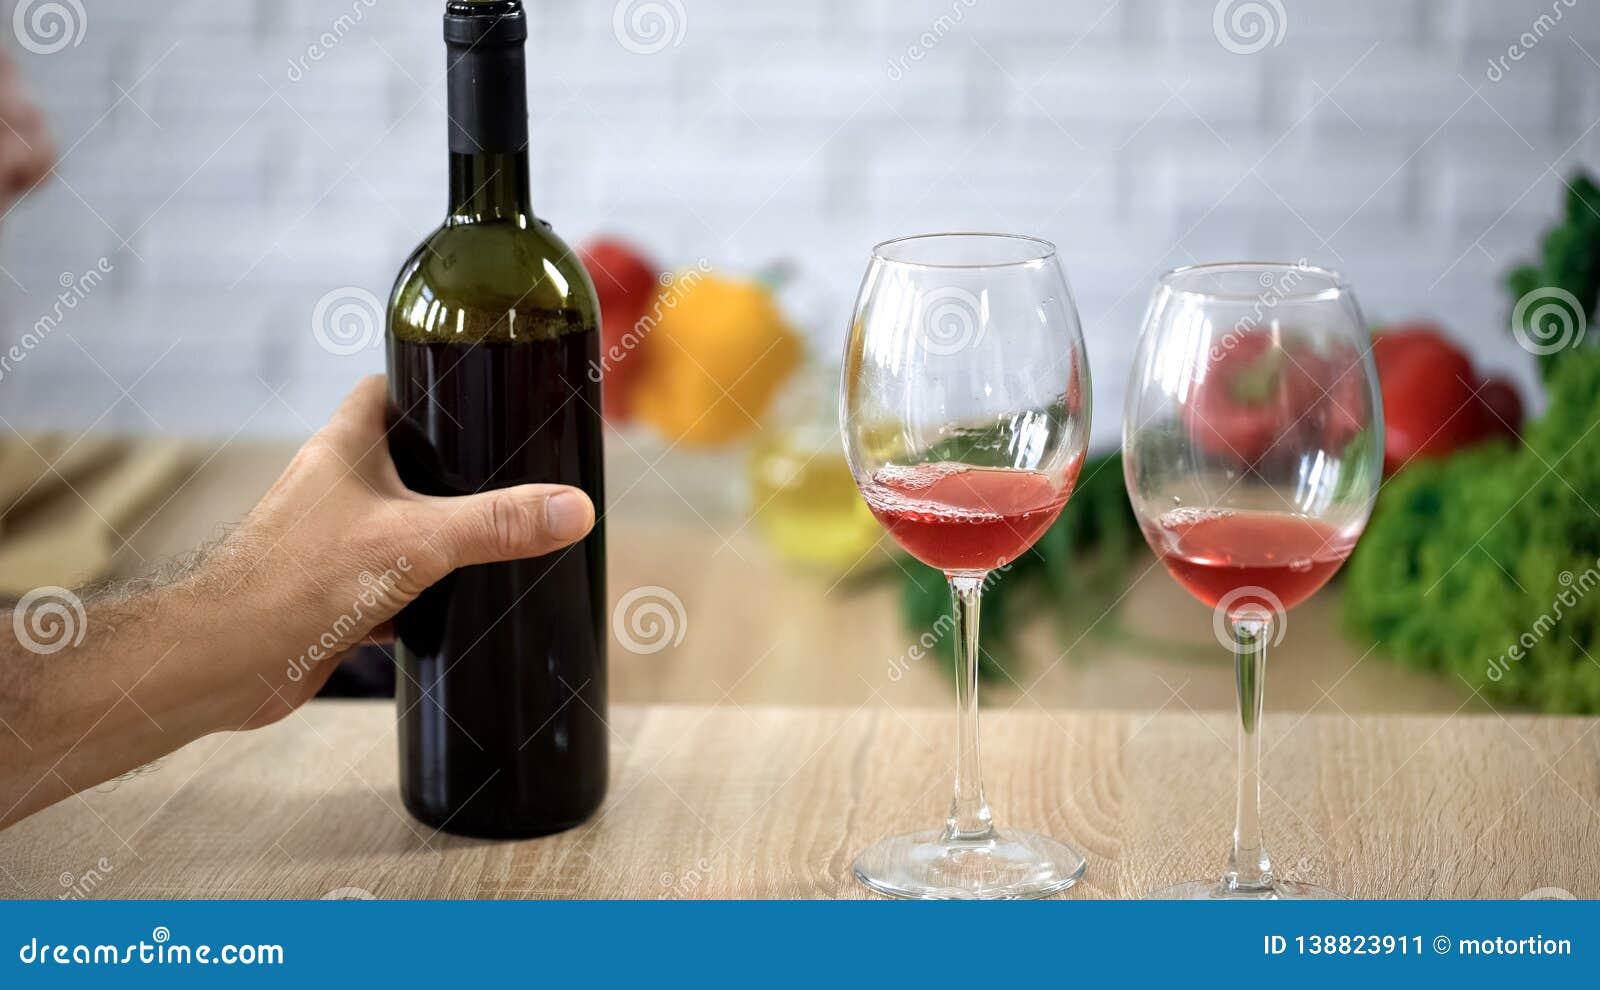 Male hand holding wine bottle, crystal glasses on table, alcohol degustation